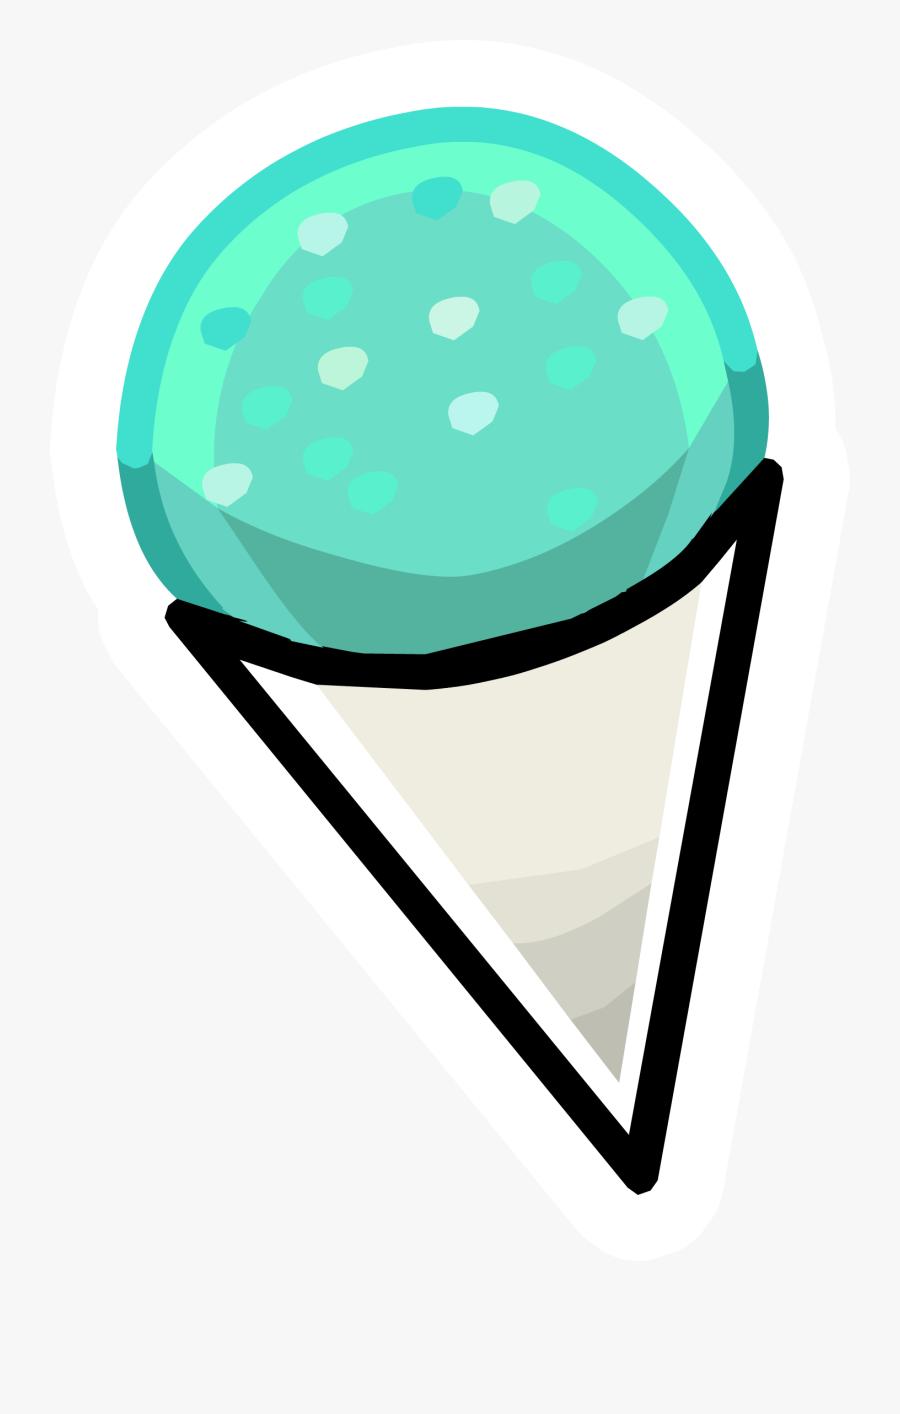 Snow Clipart Igloo - Blue Snow Cone Clipart, Transparent Clipart